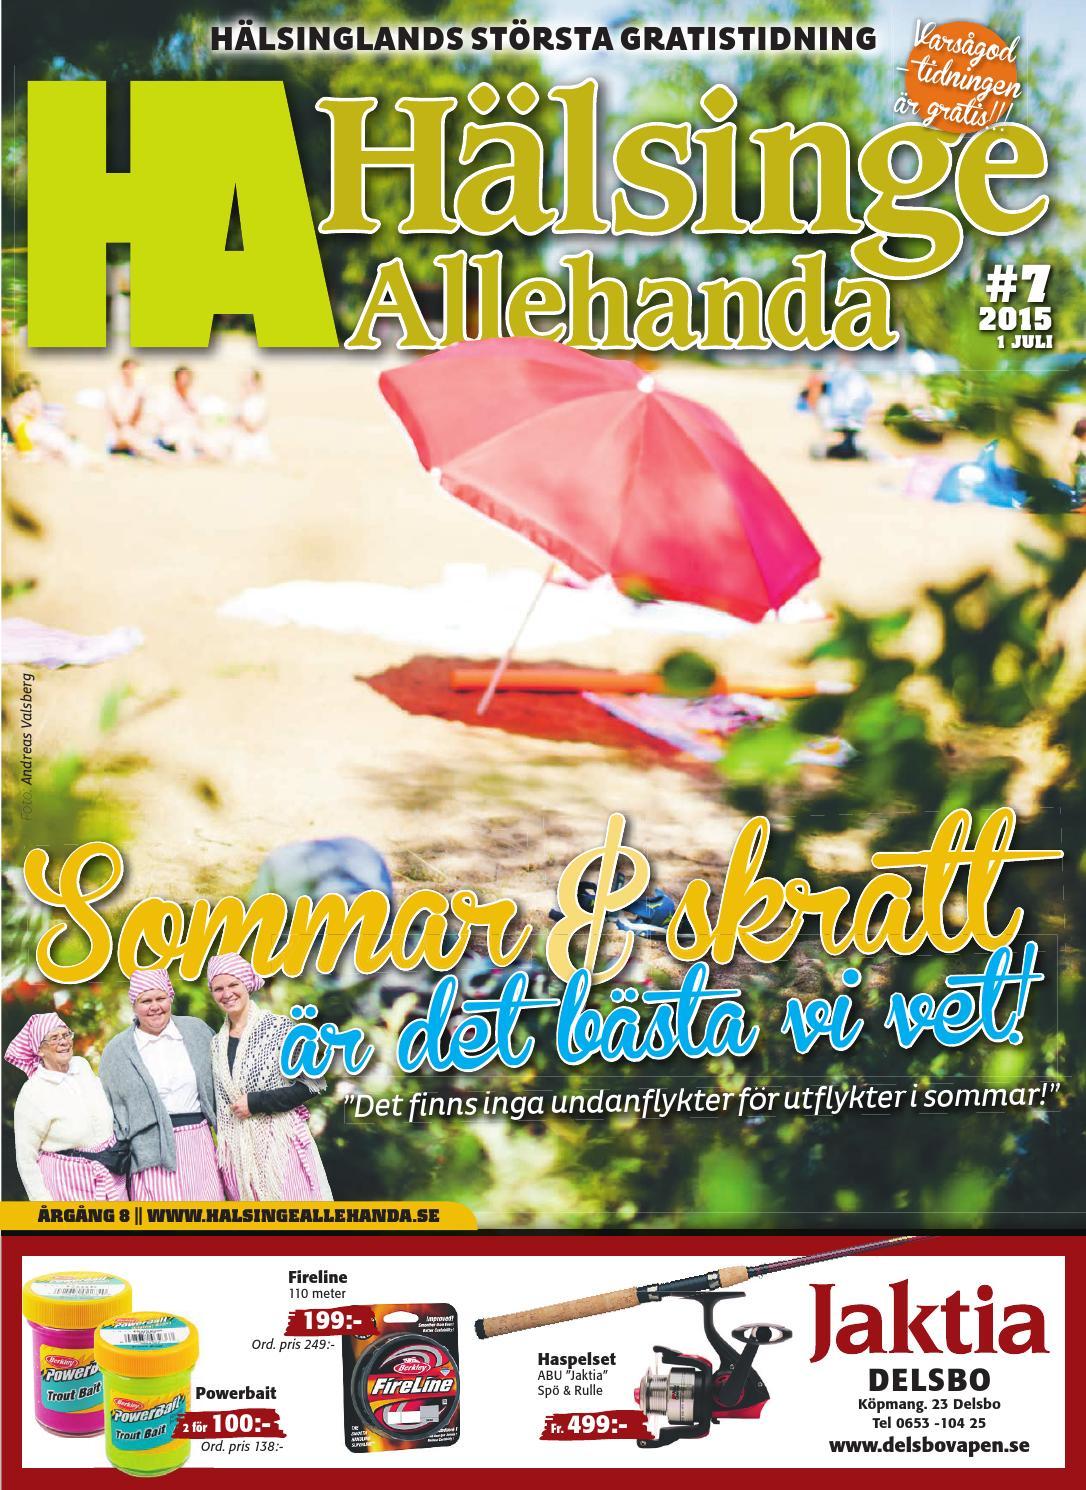 Ola Hell, Hlsingtuna 65, Hudiksvall | unam.net